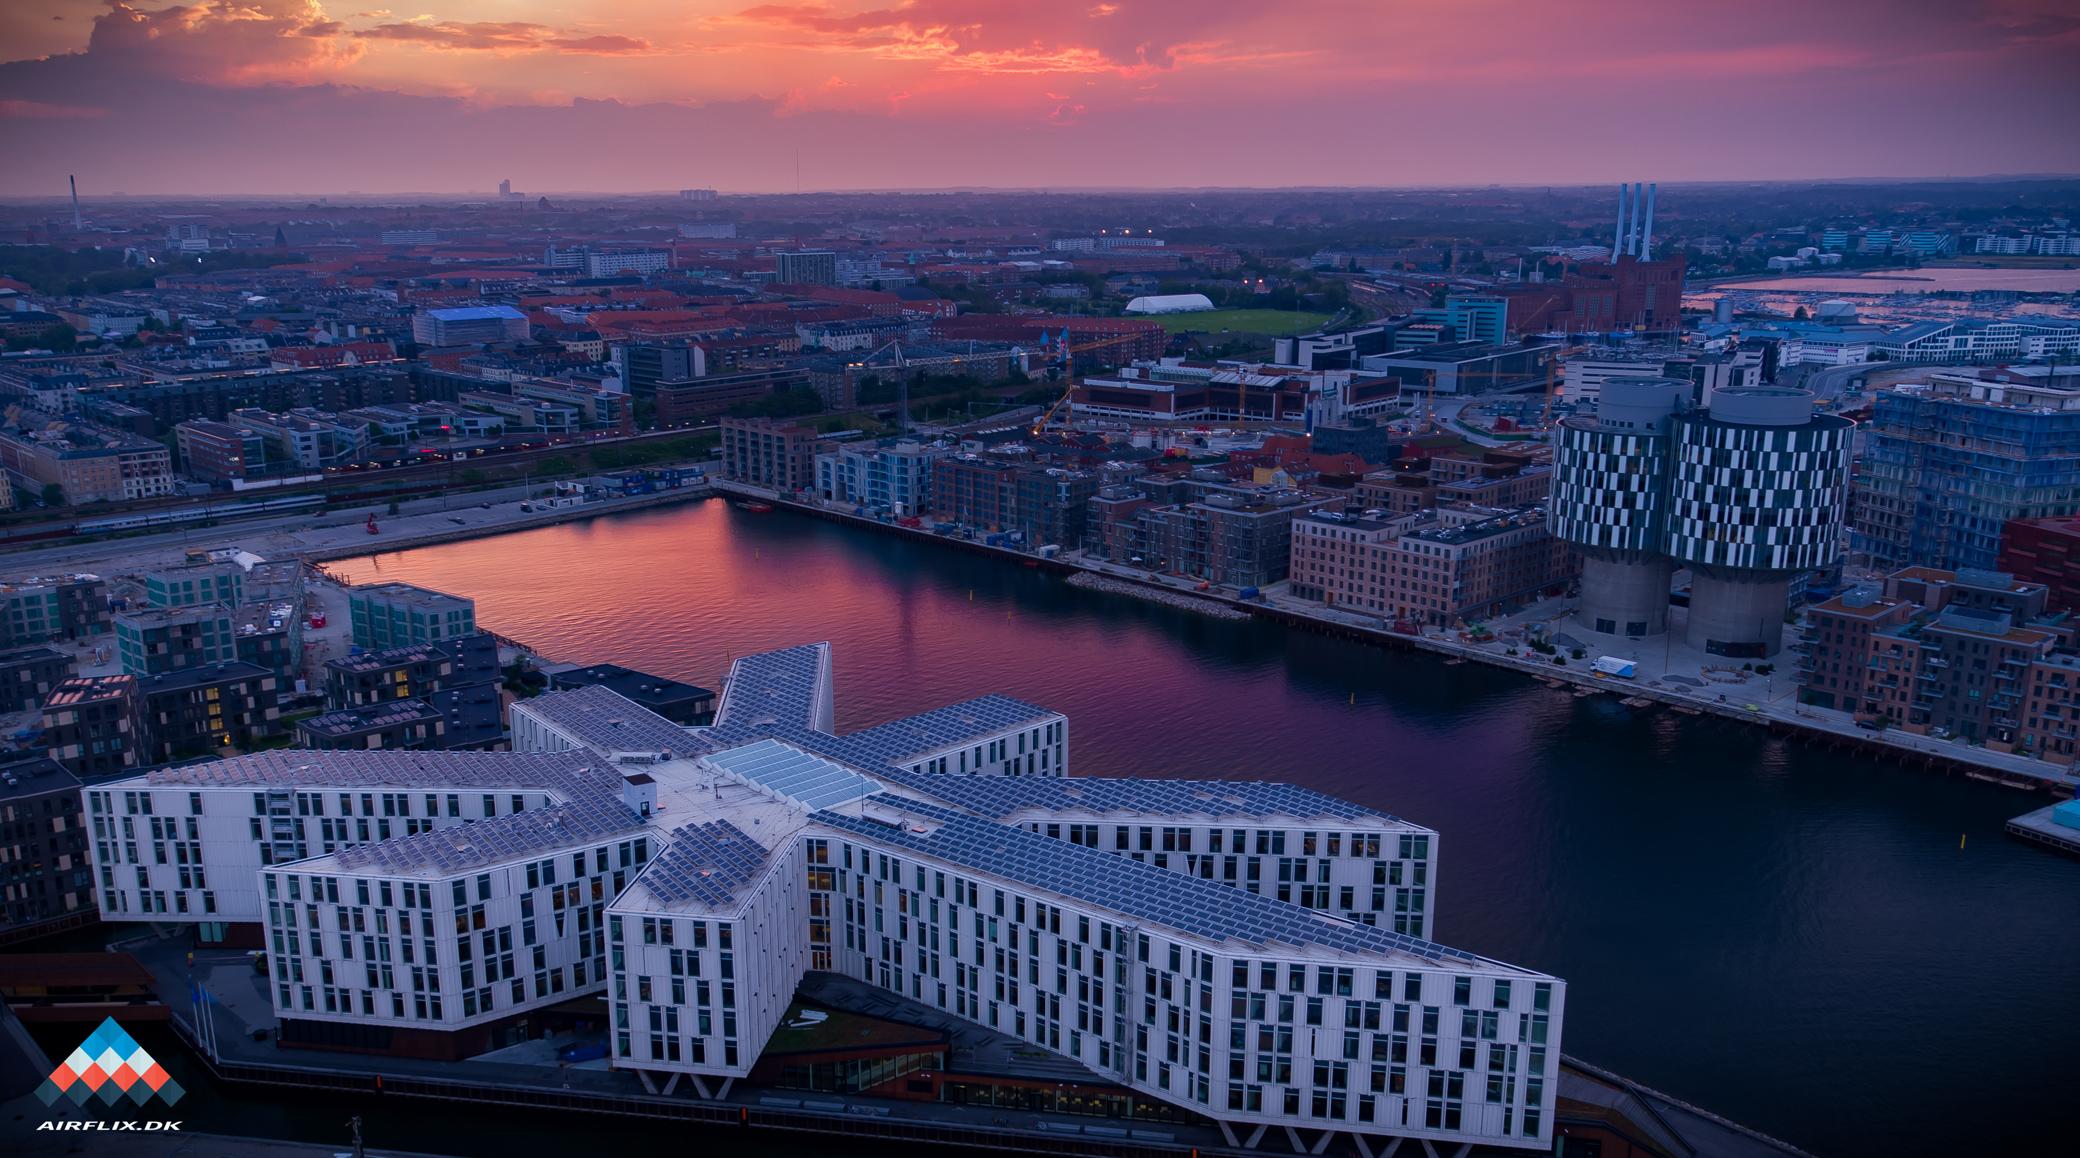 Nordhavn-drone-foto-copenhagen